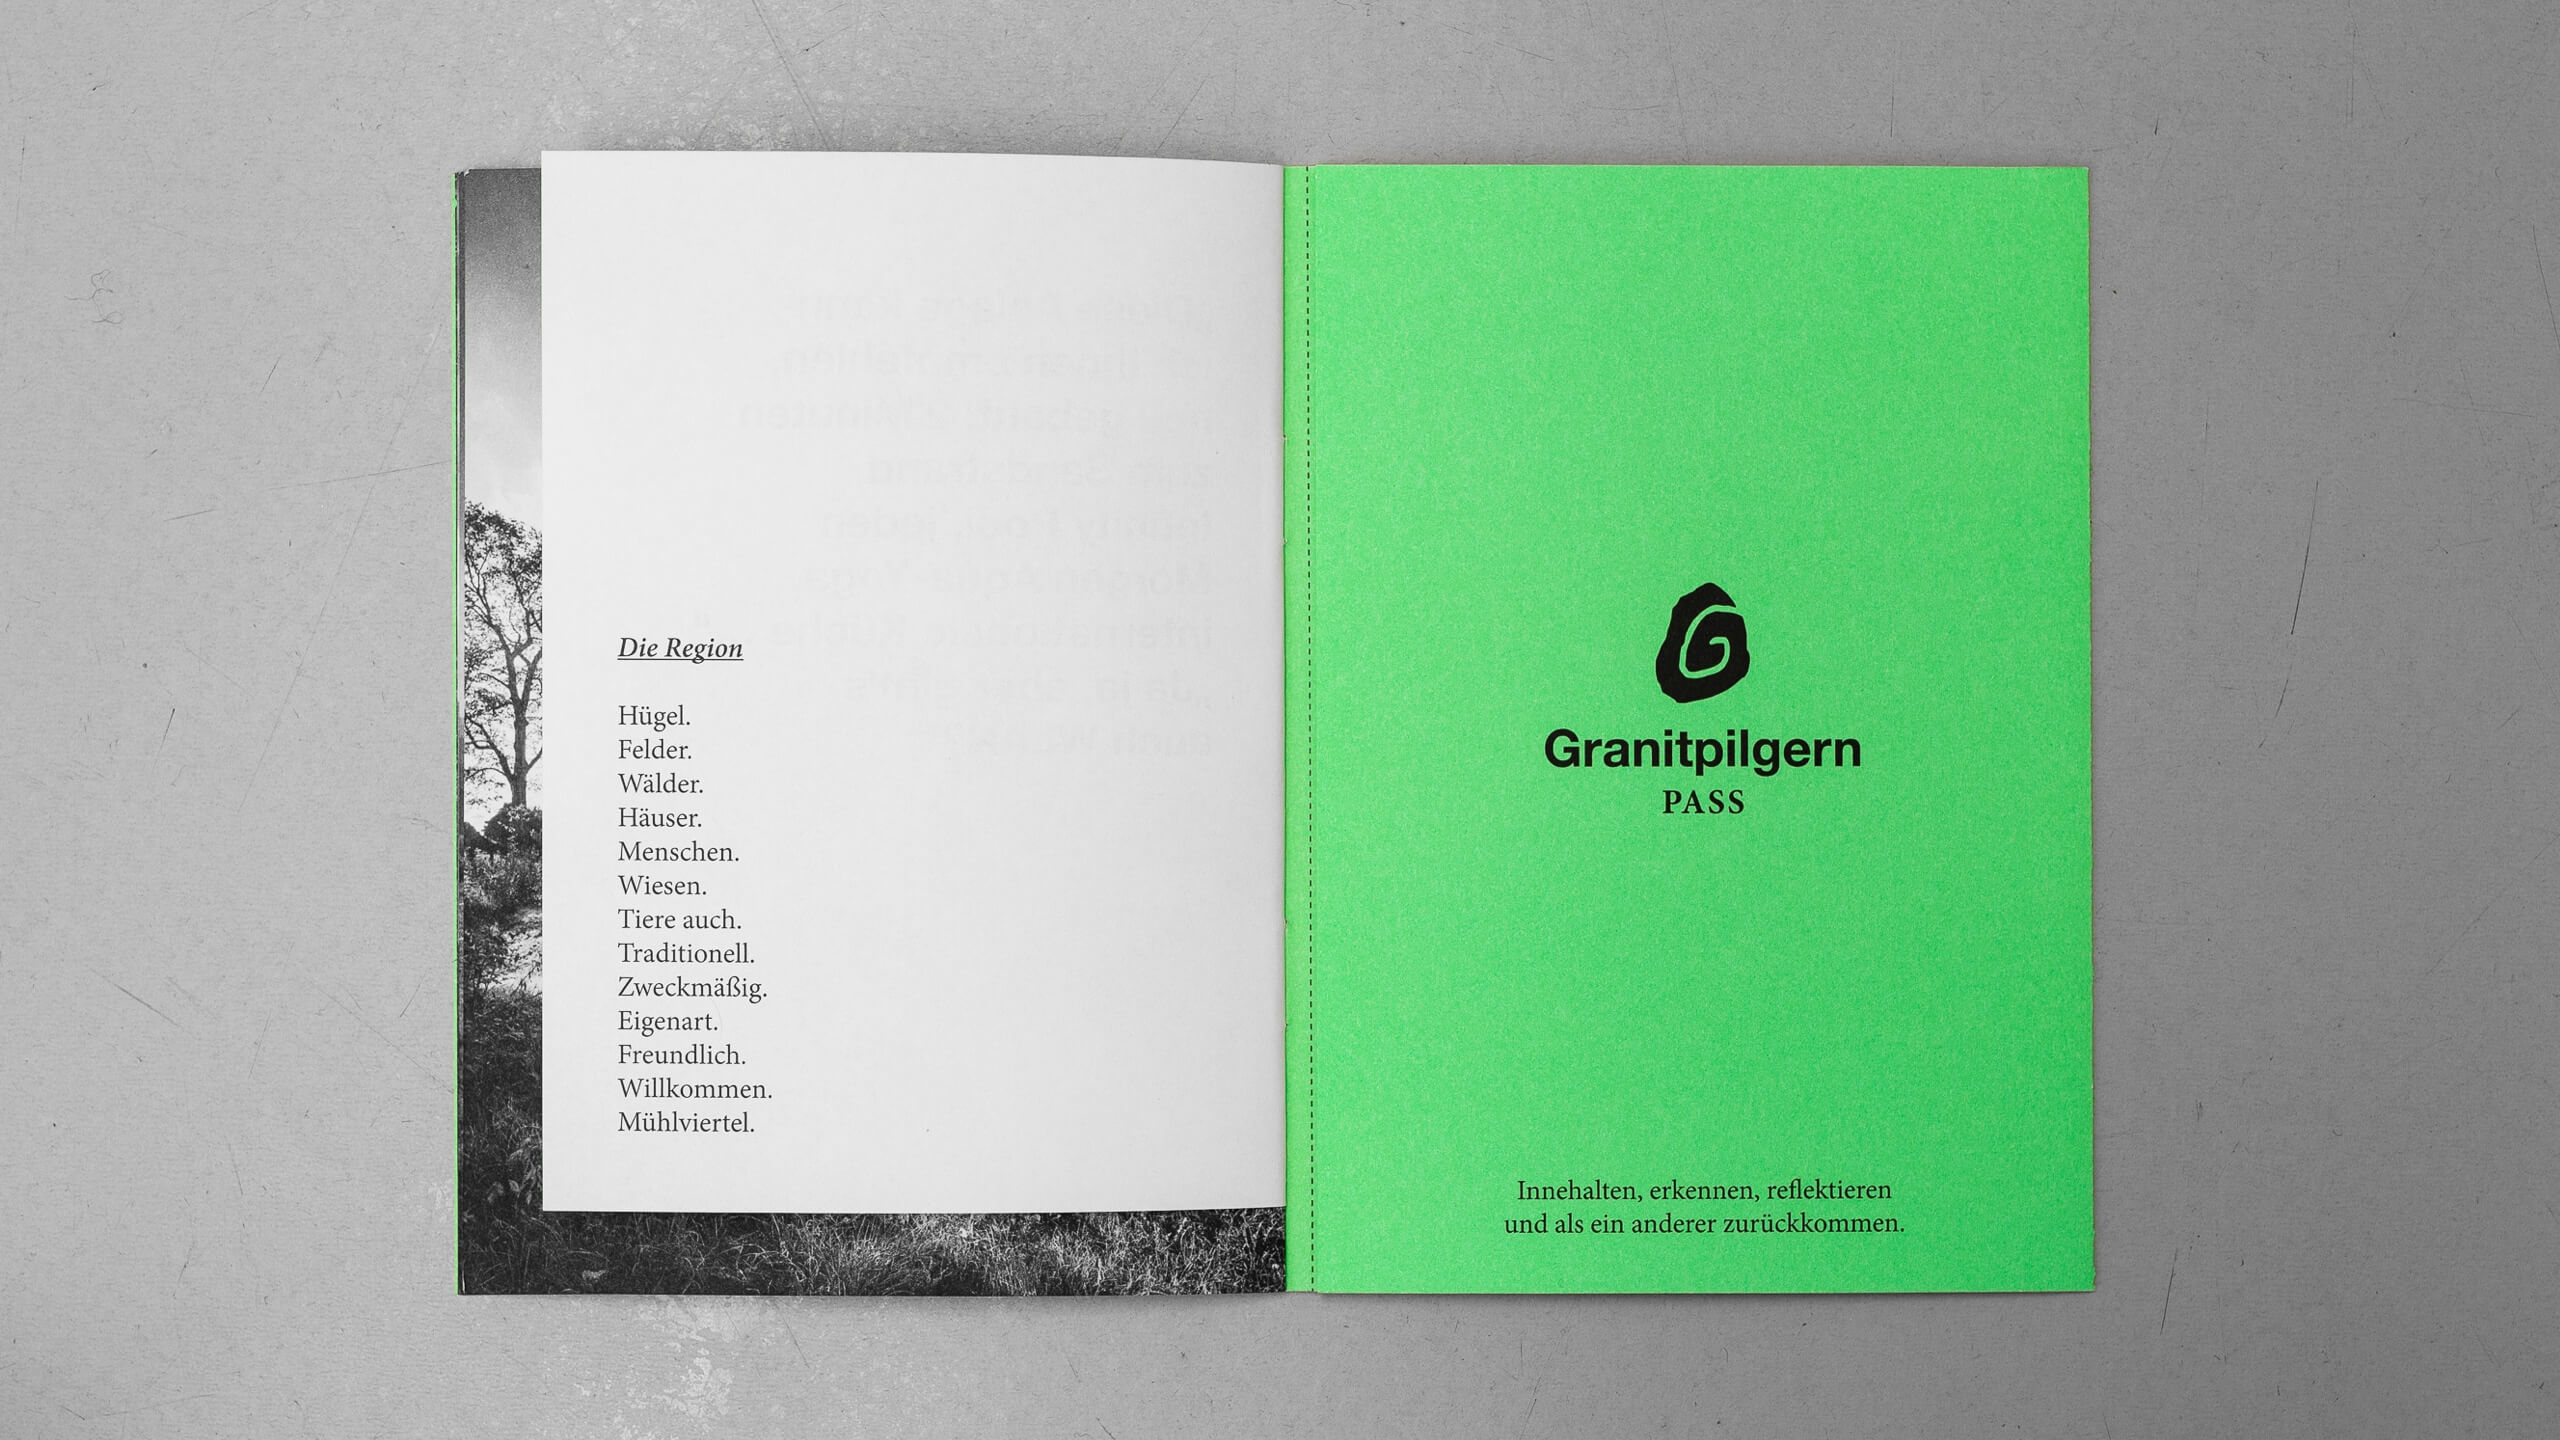 Ref Granit Stempelpass Seiten 06 2560X1600